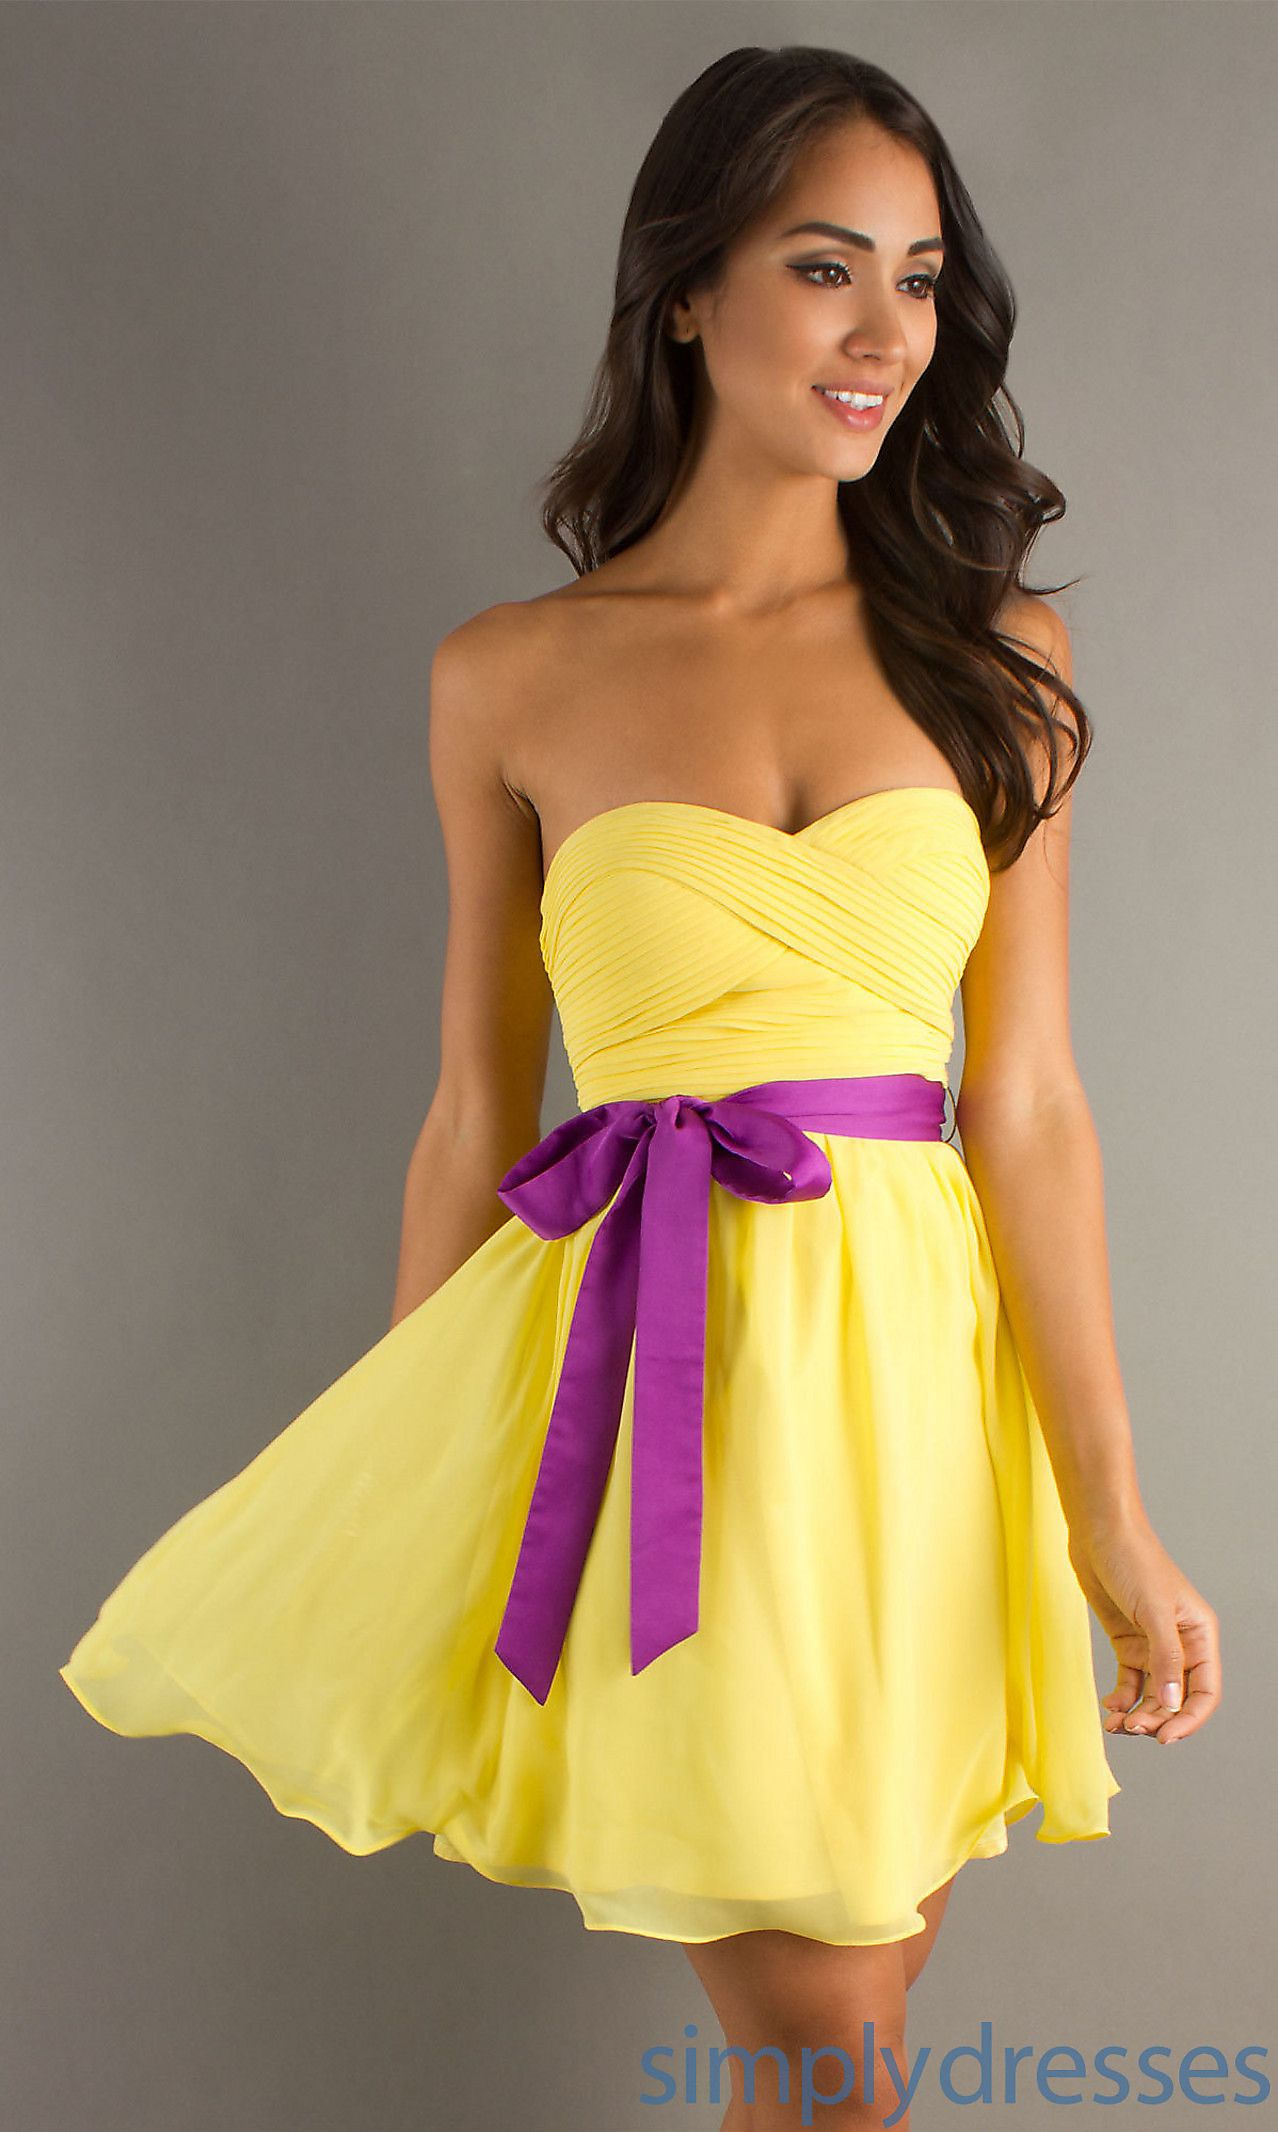 29++ Yellow wedding dress short ideas in 2021